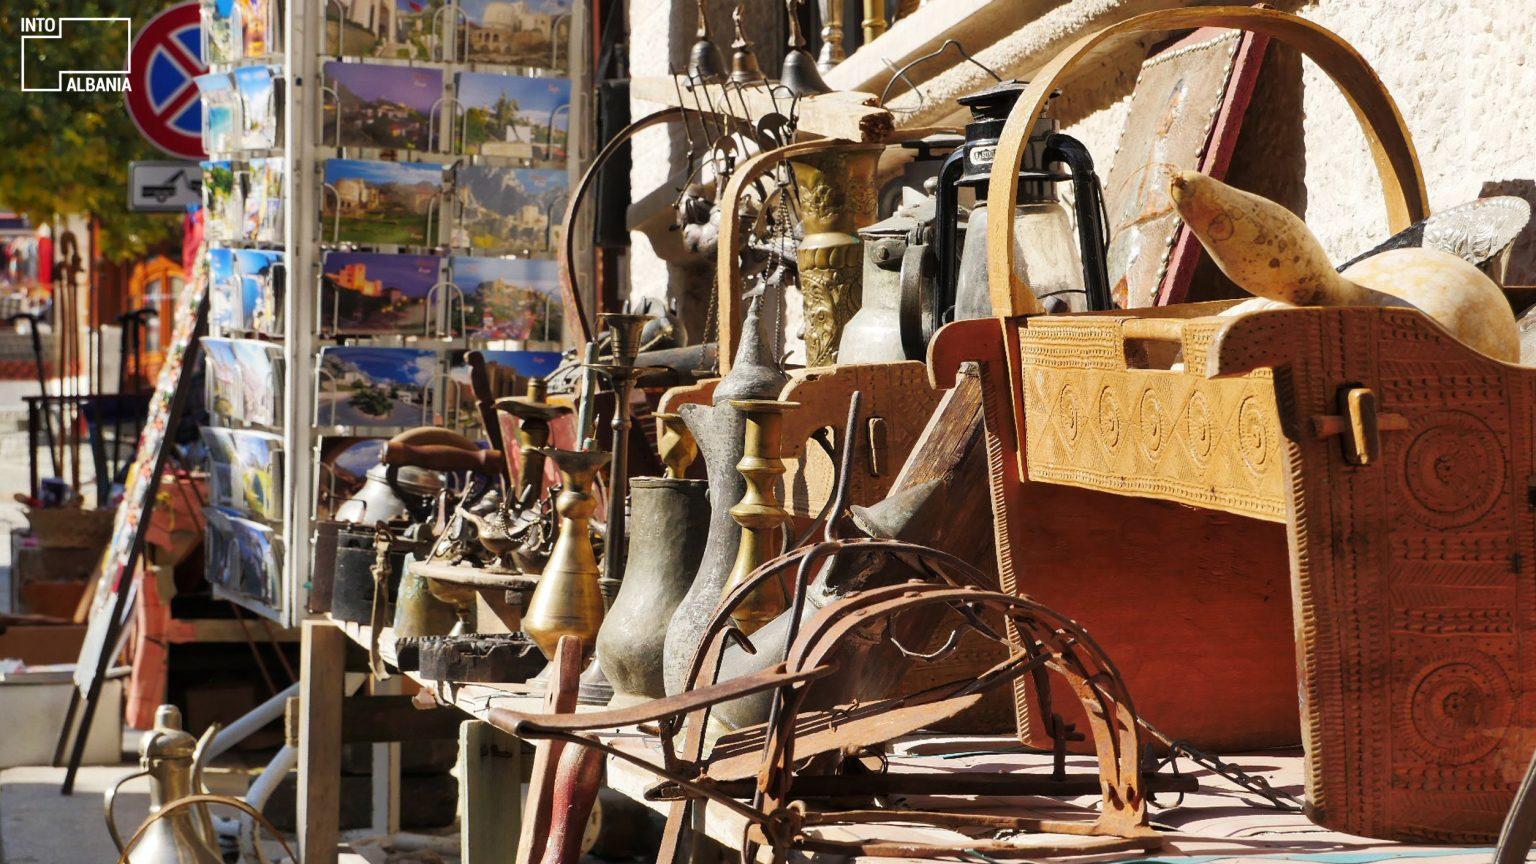 Old Bazaar of Kruja, photo by IntoAlbania